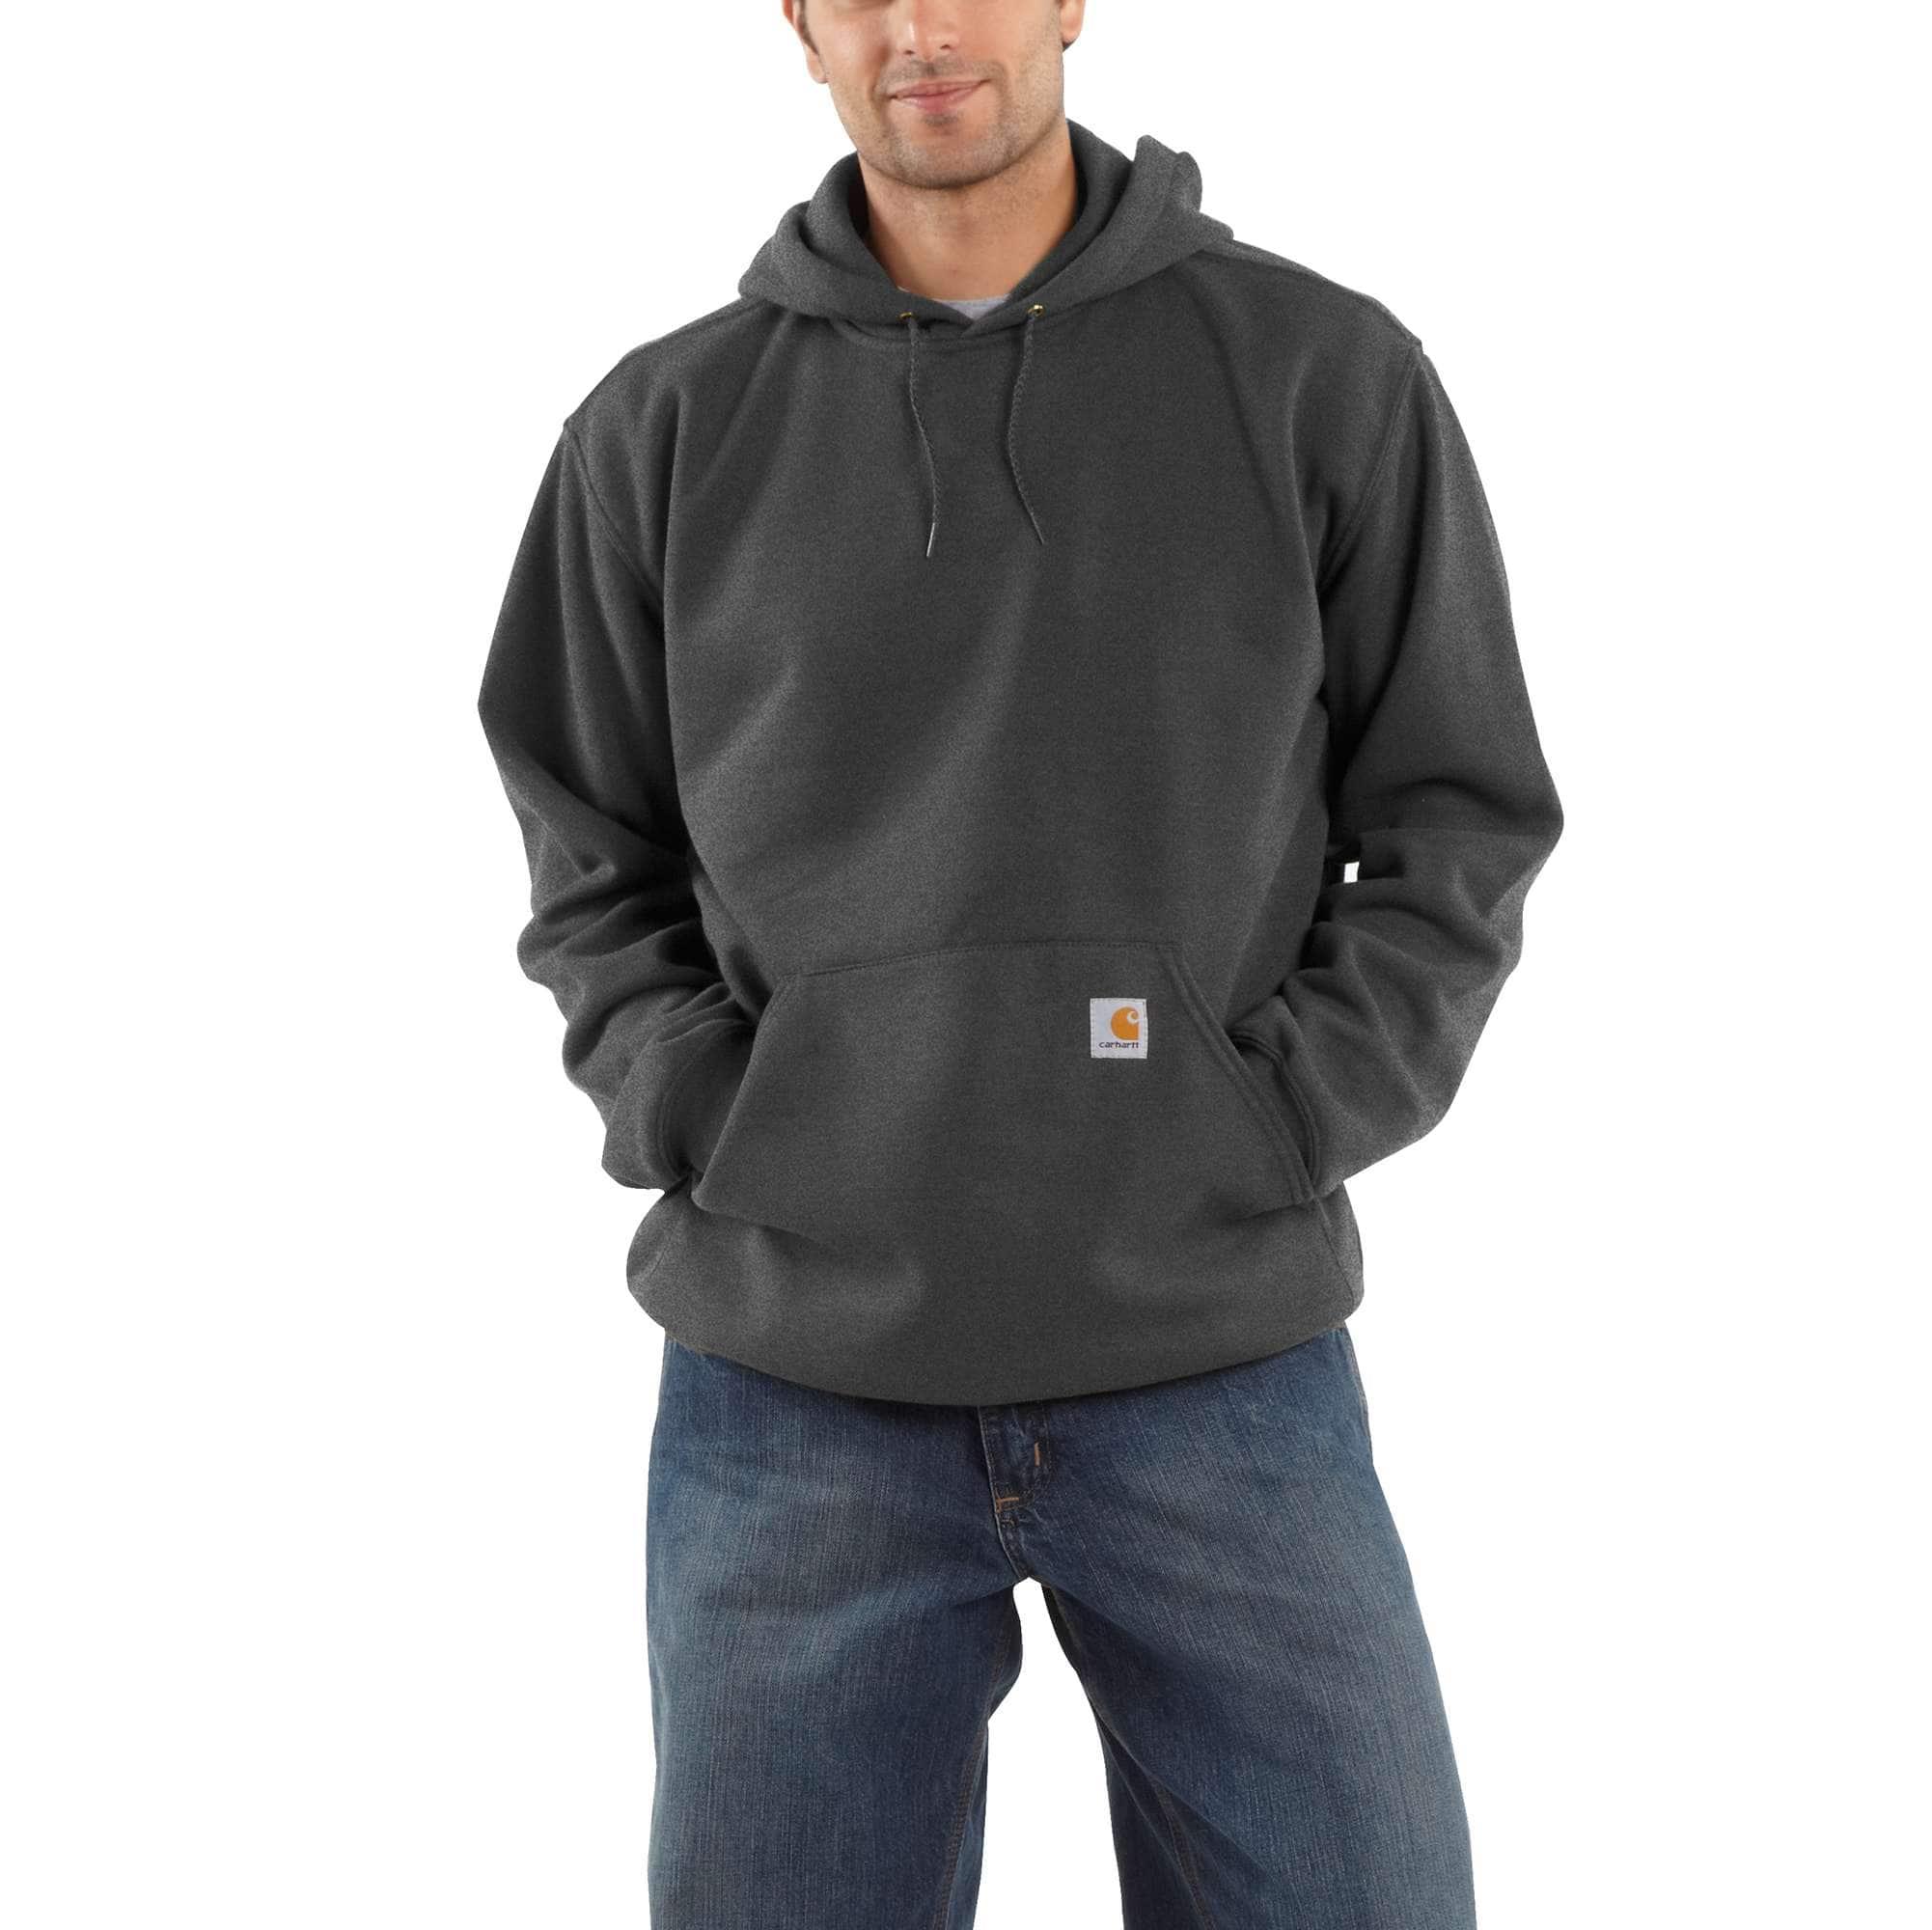 dcbc4ee4a Carhartt Mens Midweight Hooded Pullover Sweatshirt | Azərbaycan ...